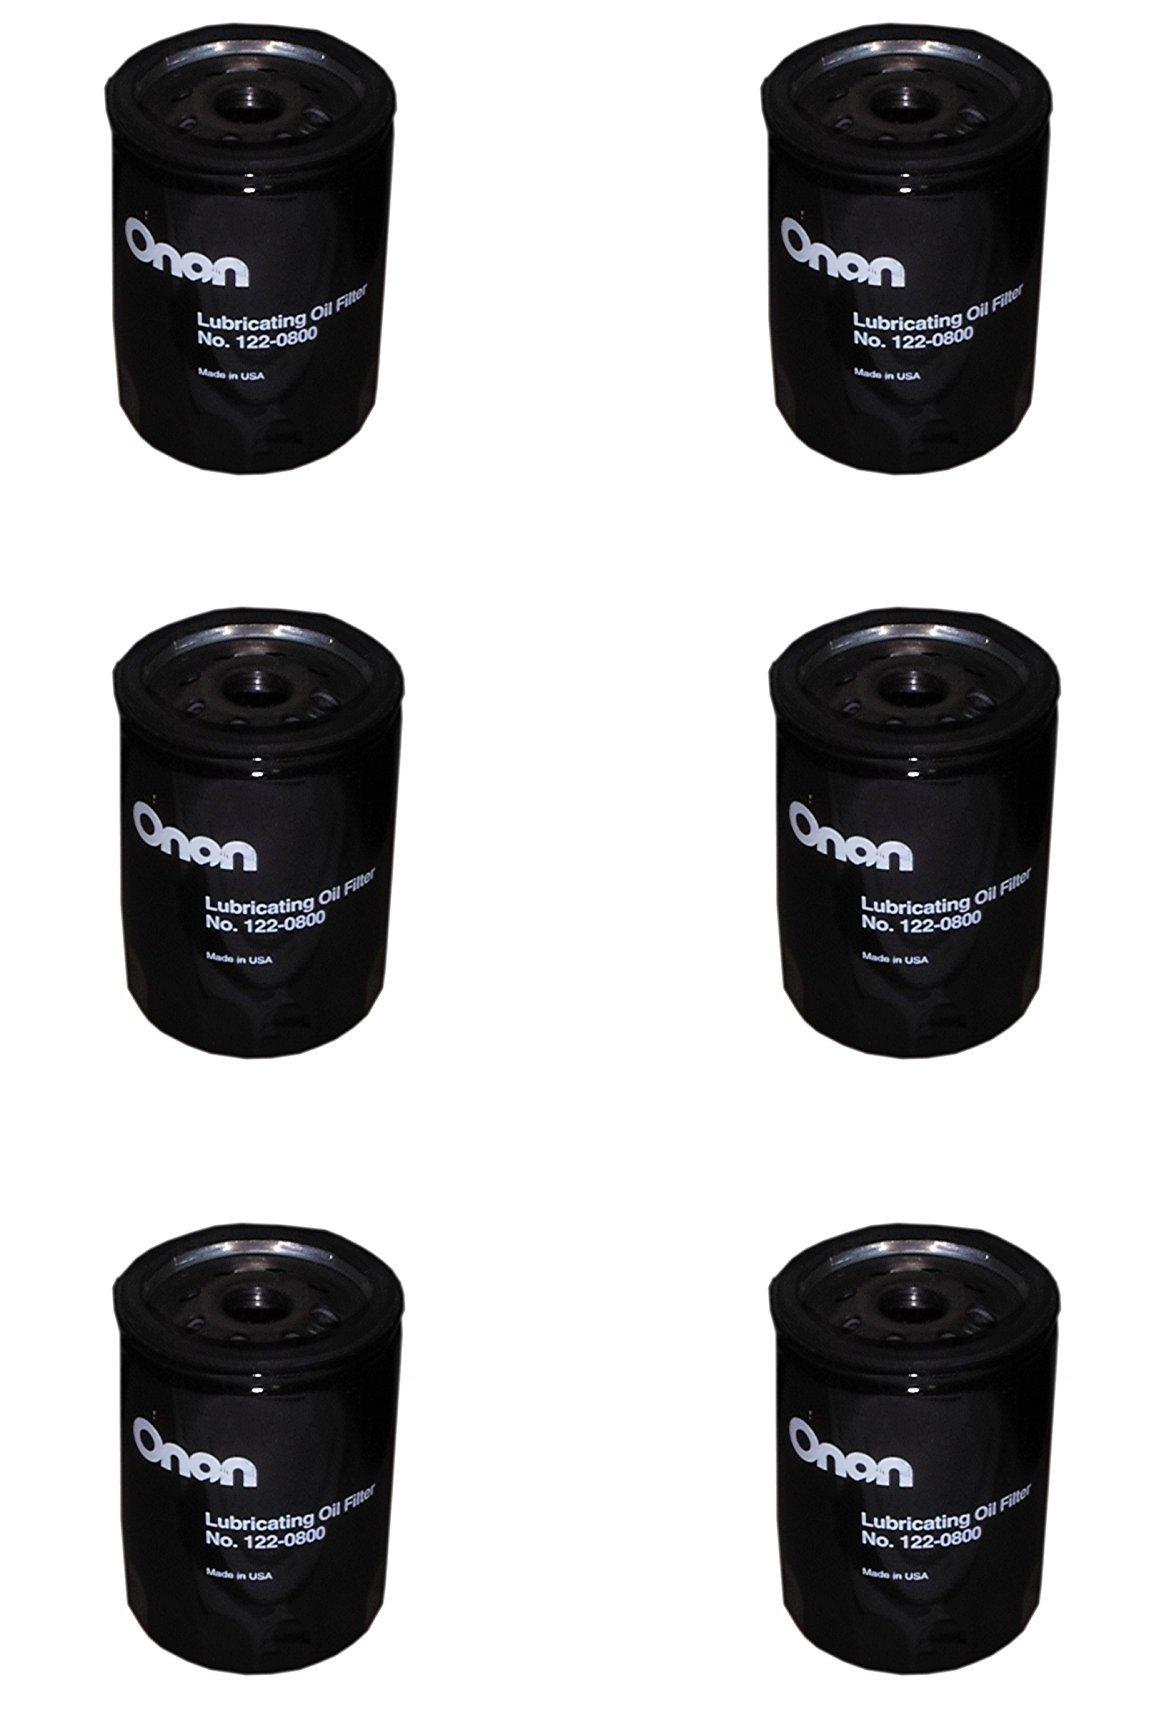 RV Trailer Camper Appliances Emerald Iii (Nhe) Oil Filter 0122-0800 (6)